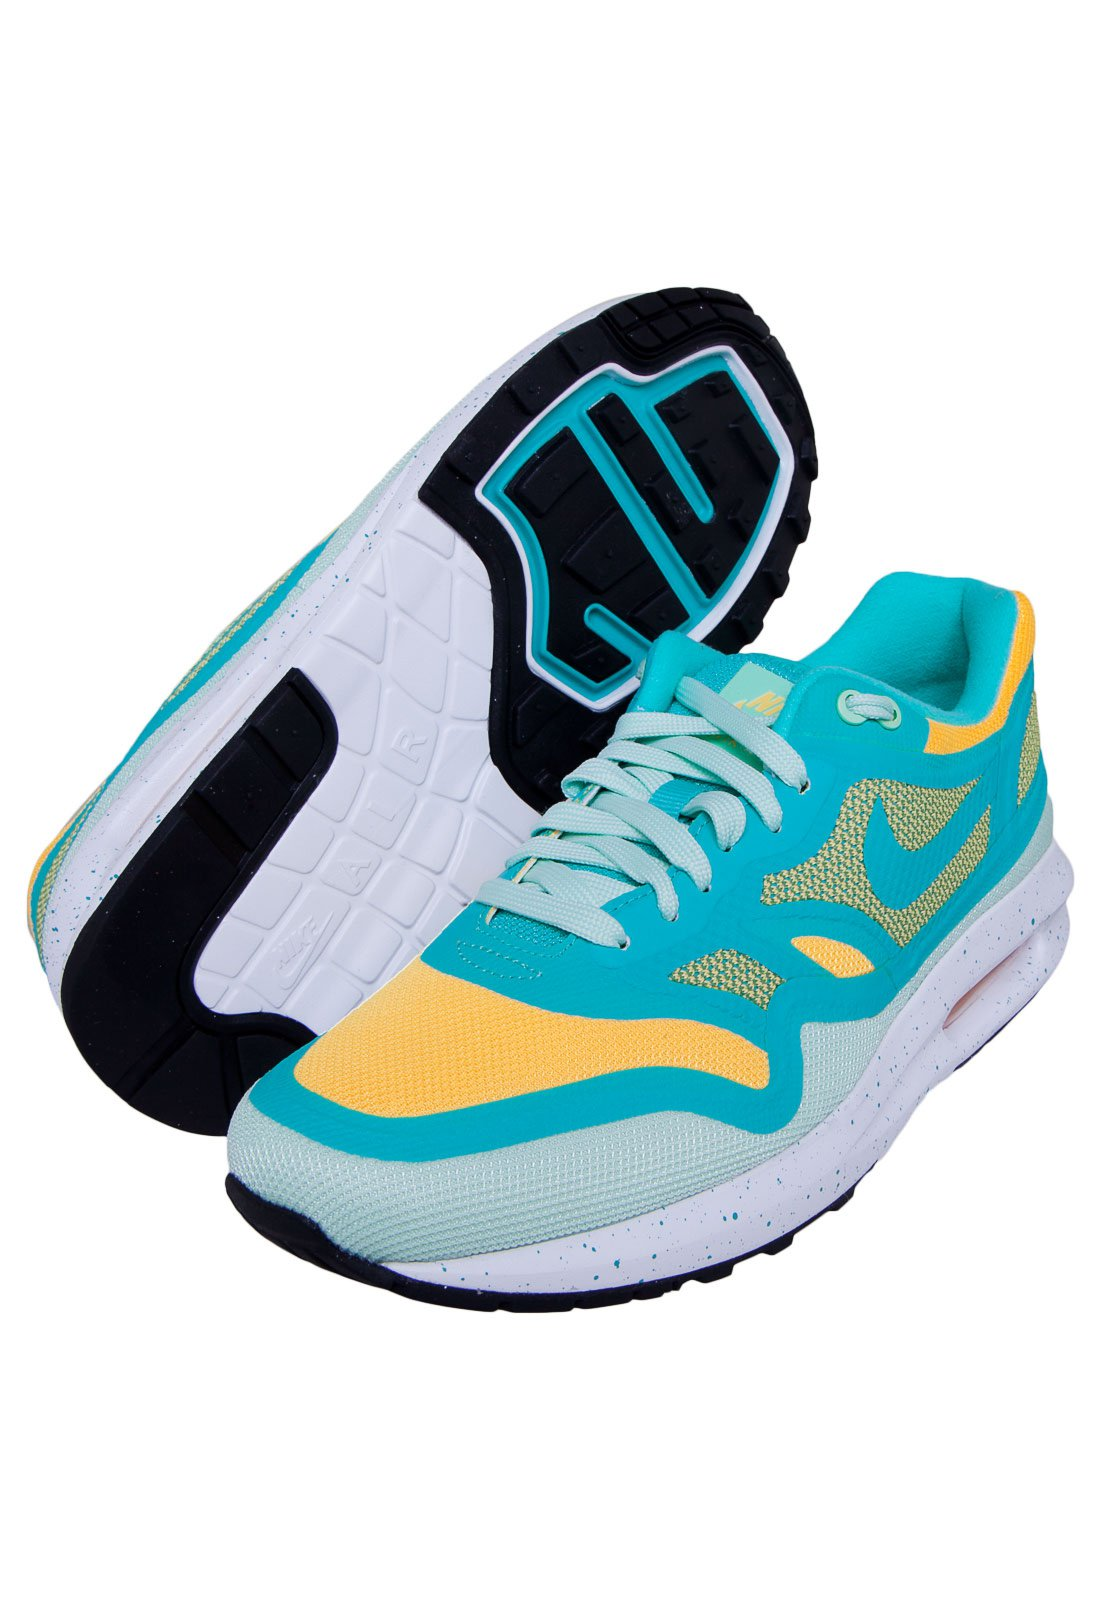 Gastos de envío Sombra estrategia  Tênis Nike Sportswear Wmns Air Max Lunar1 BR Azul - Compre Agora   Dafiti  Brasil